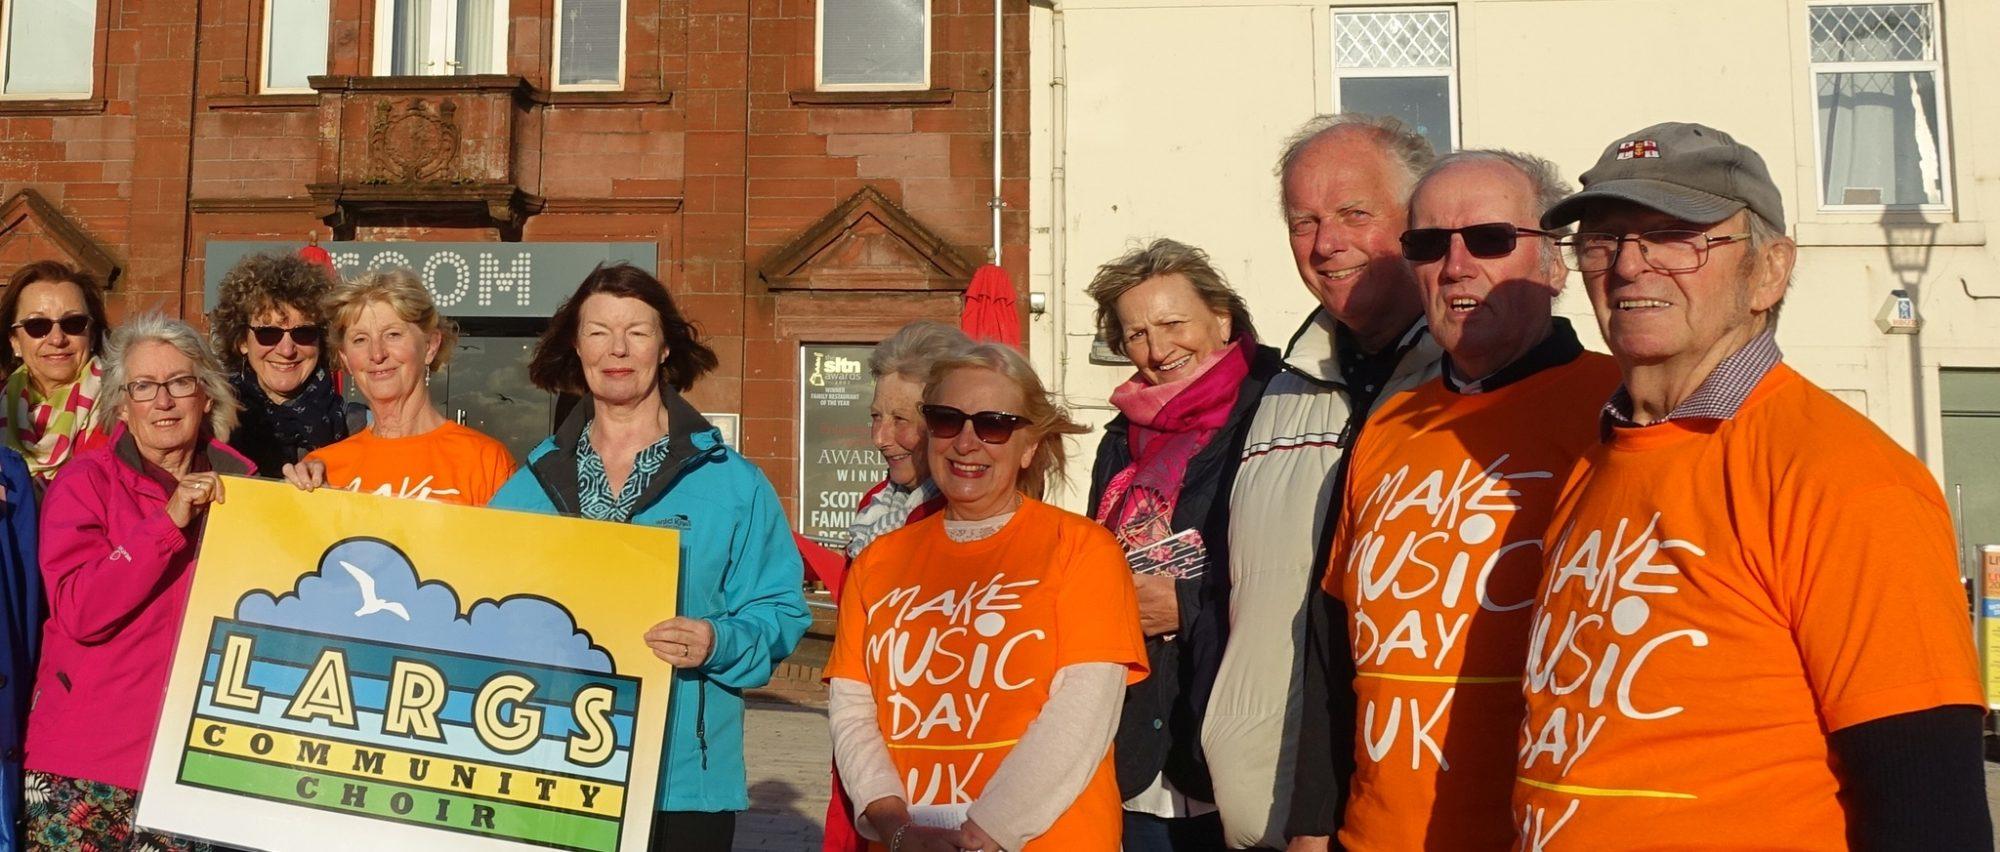 Largs Community Choir